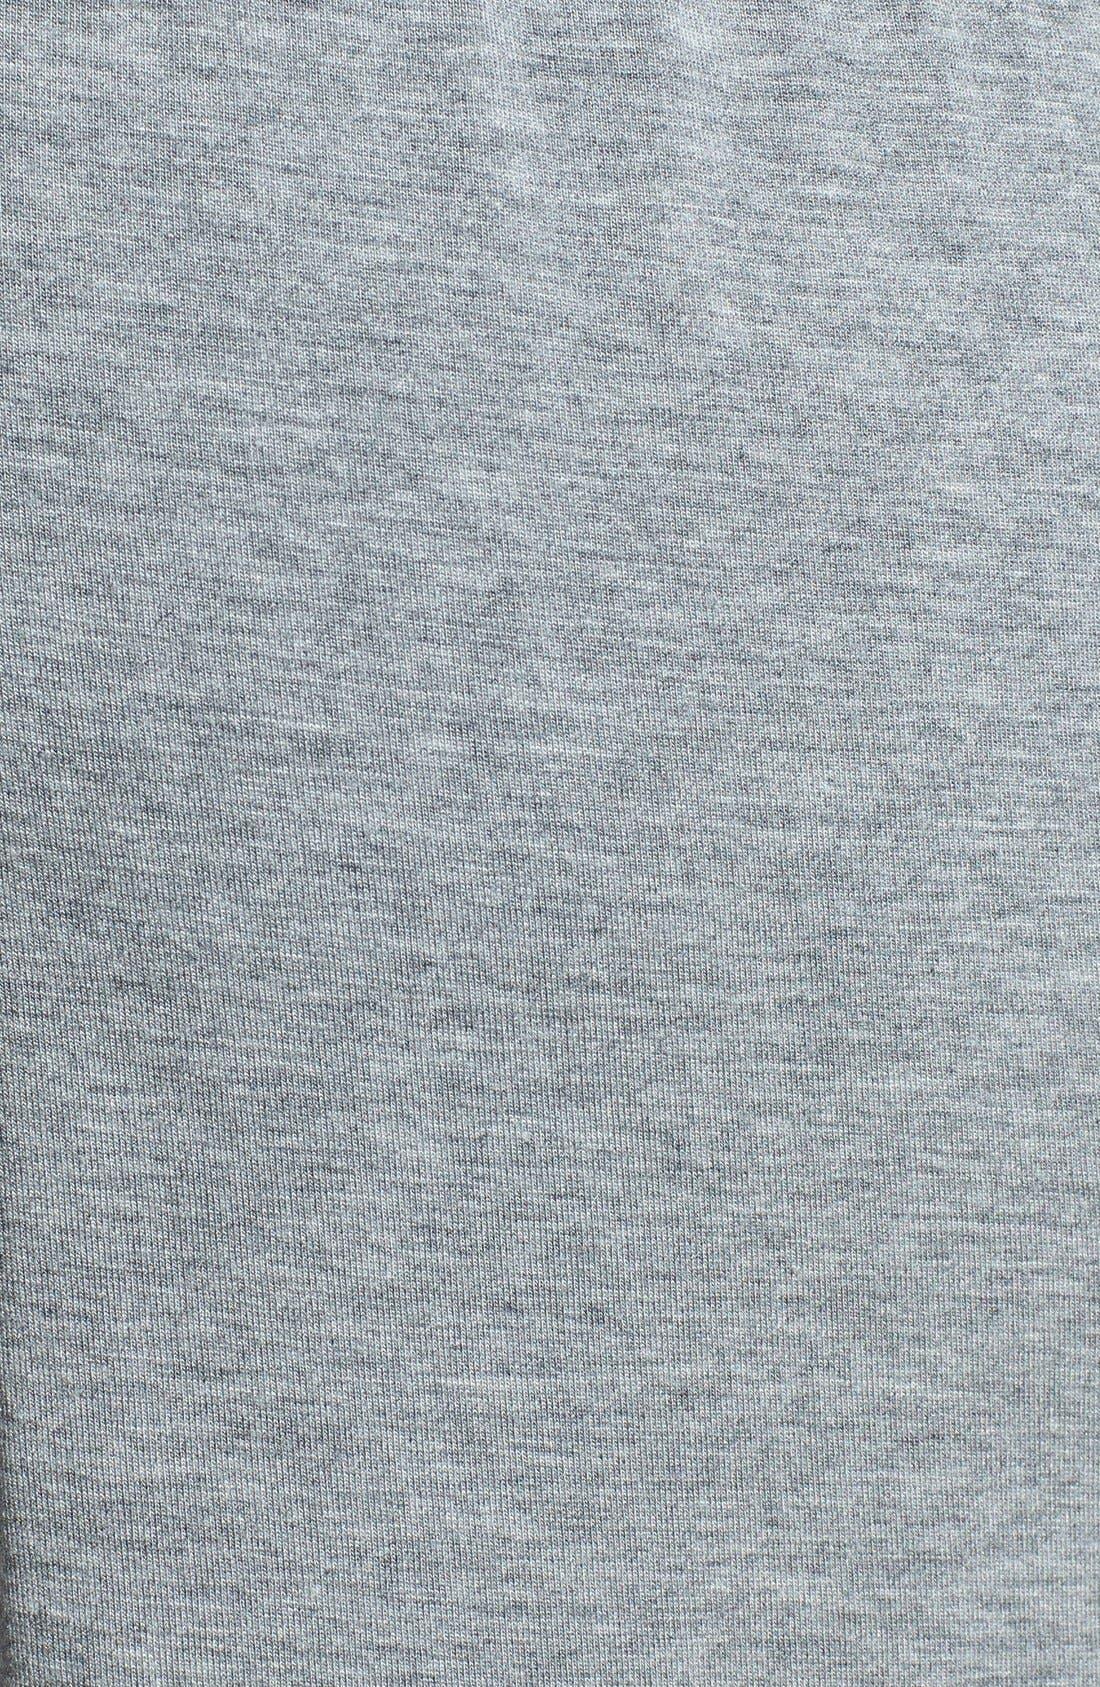 Alternate Image 3  - DKNY 'After Sunset' Short Pajamas